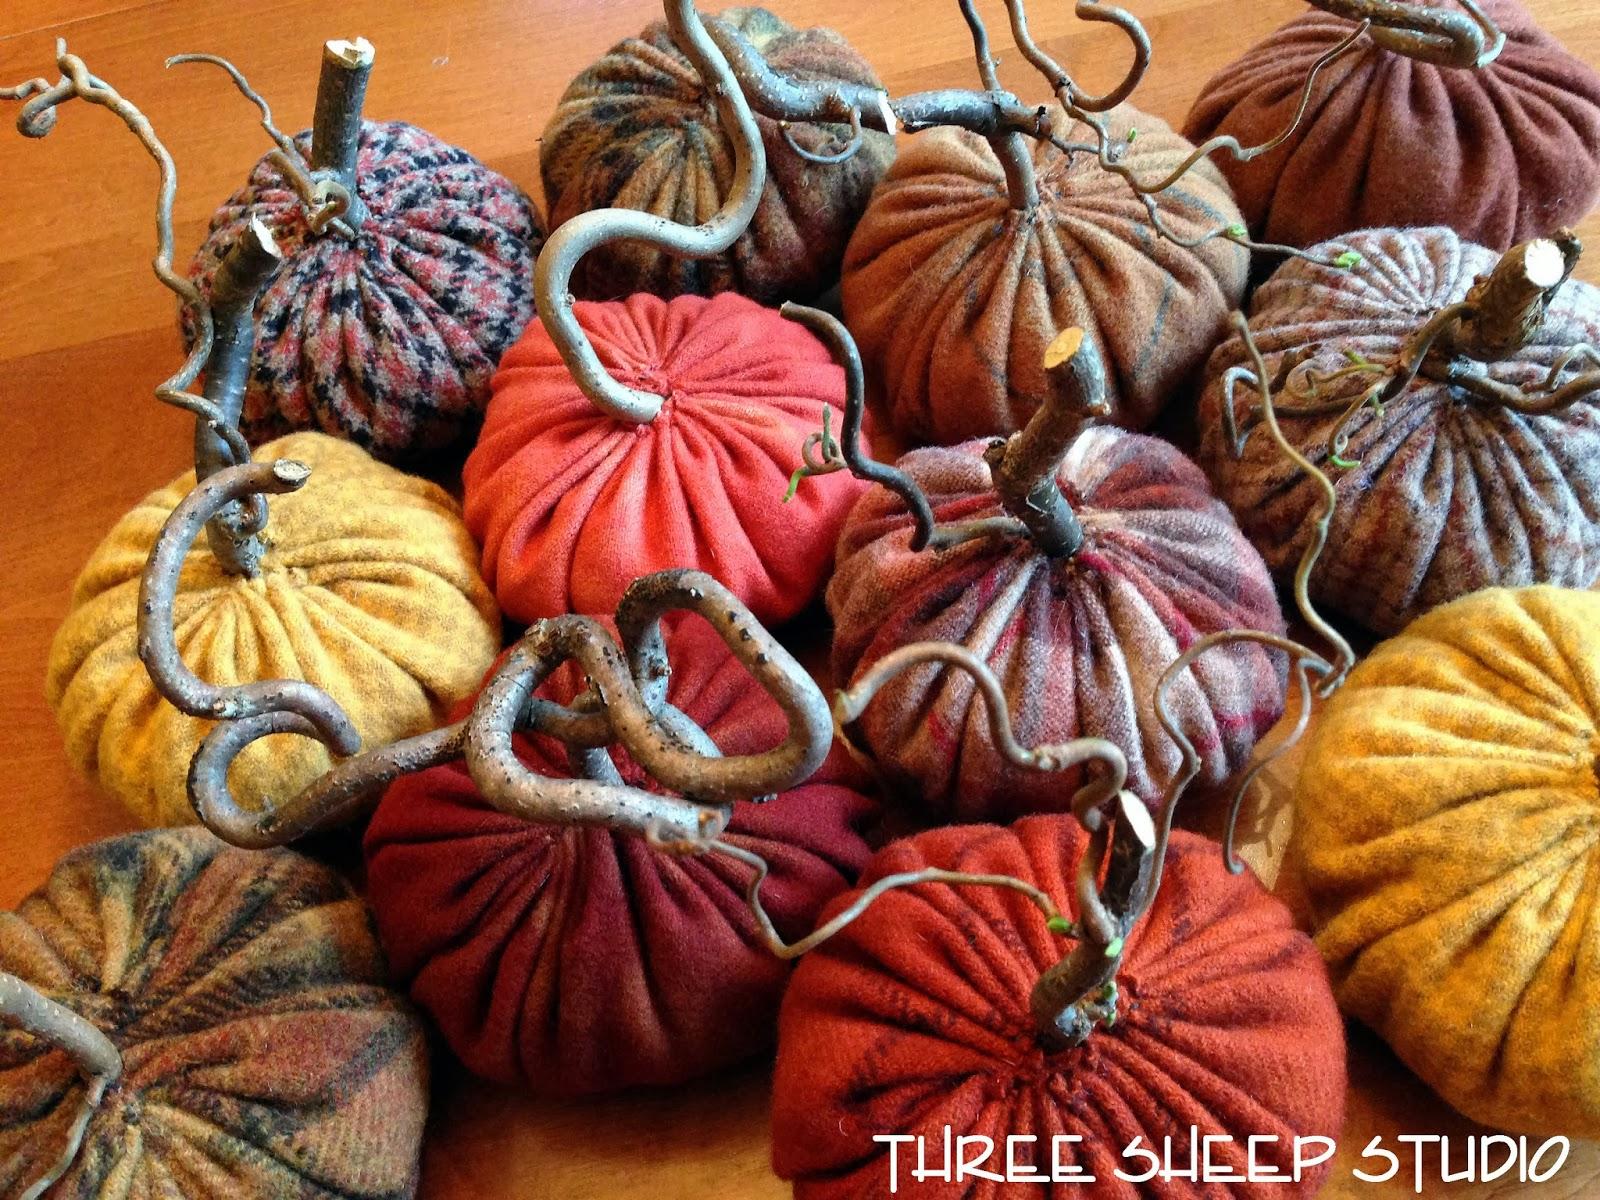 Three Sheep Studio Rustic Wool Pumpkins With Angry Gnarled Stems